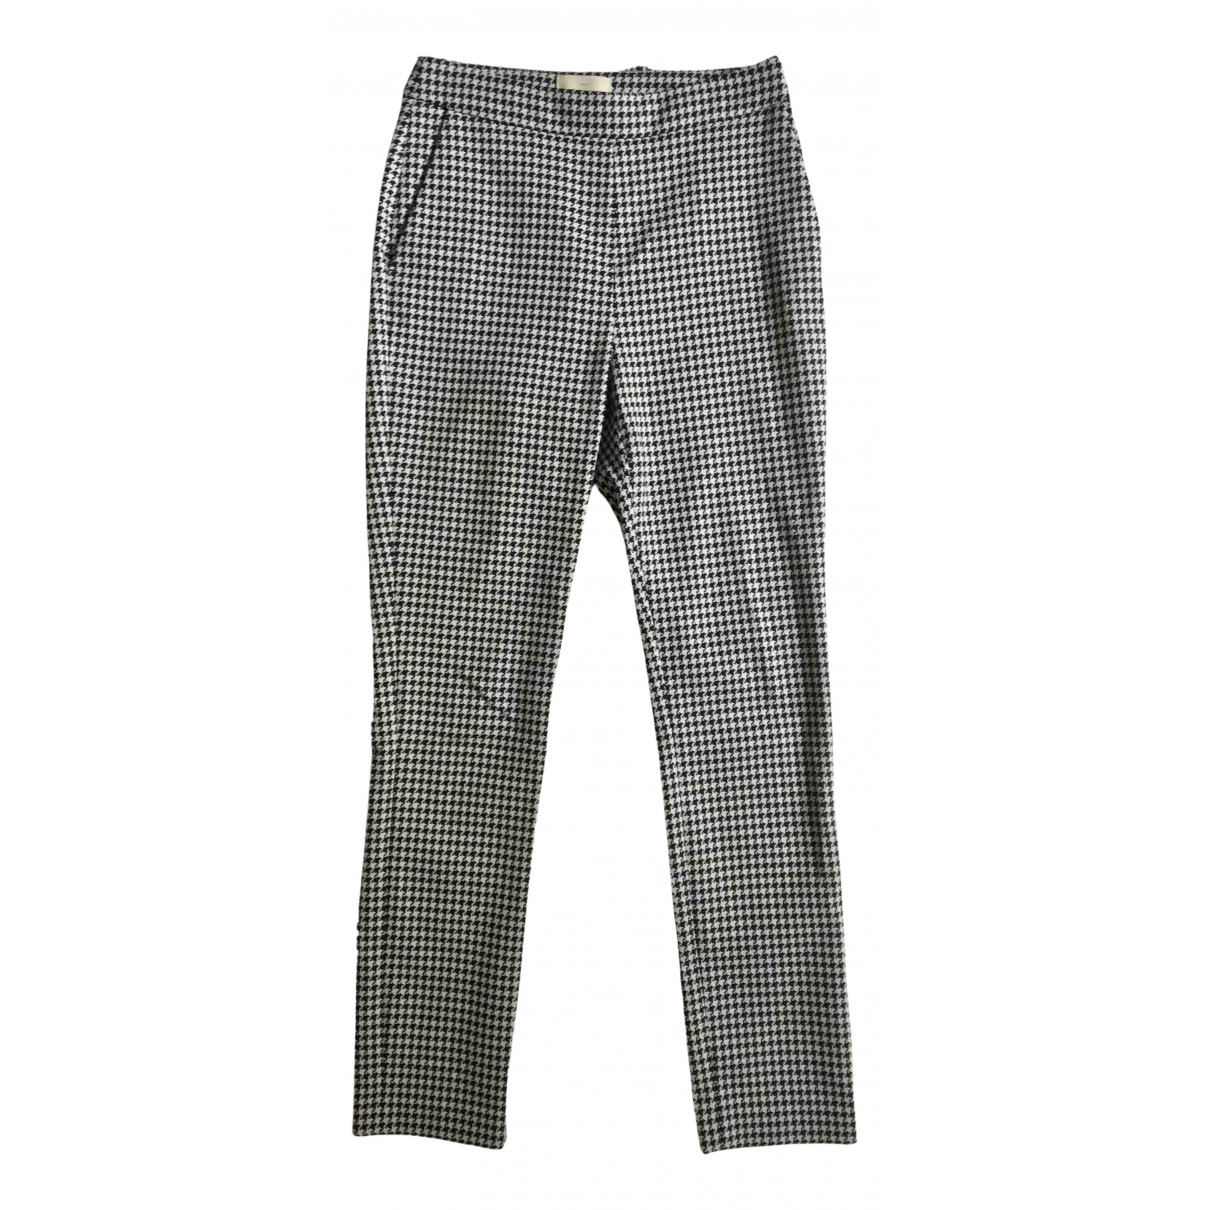 Pantalon Spring Summer 2019 en Algodon Sezane